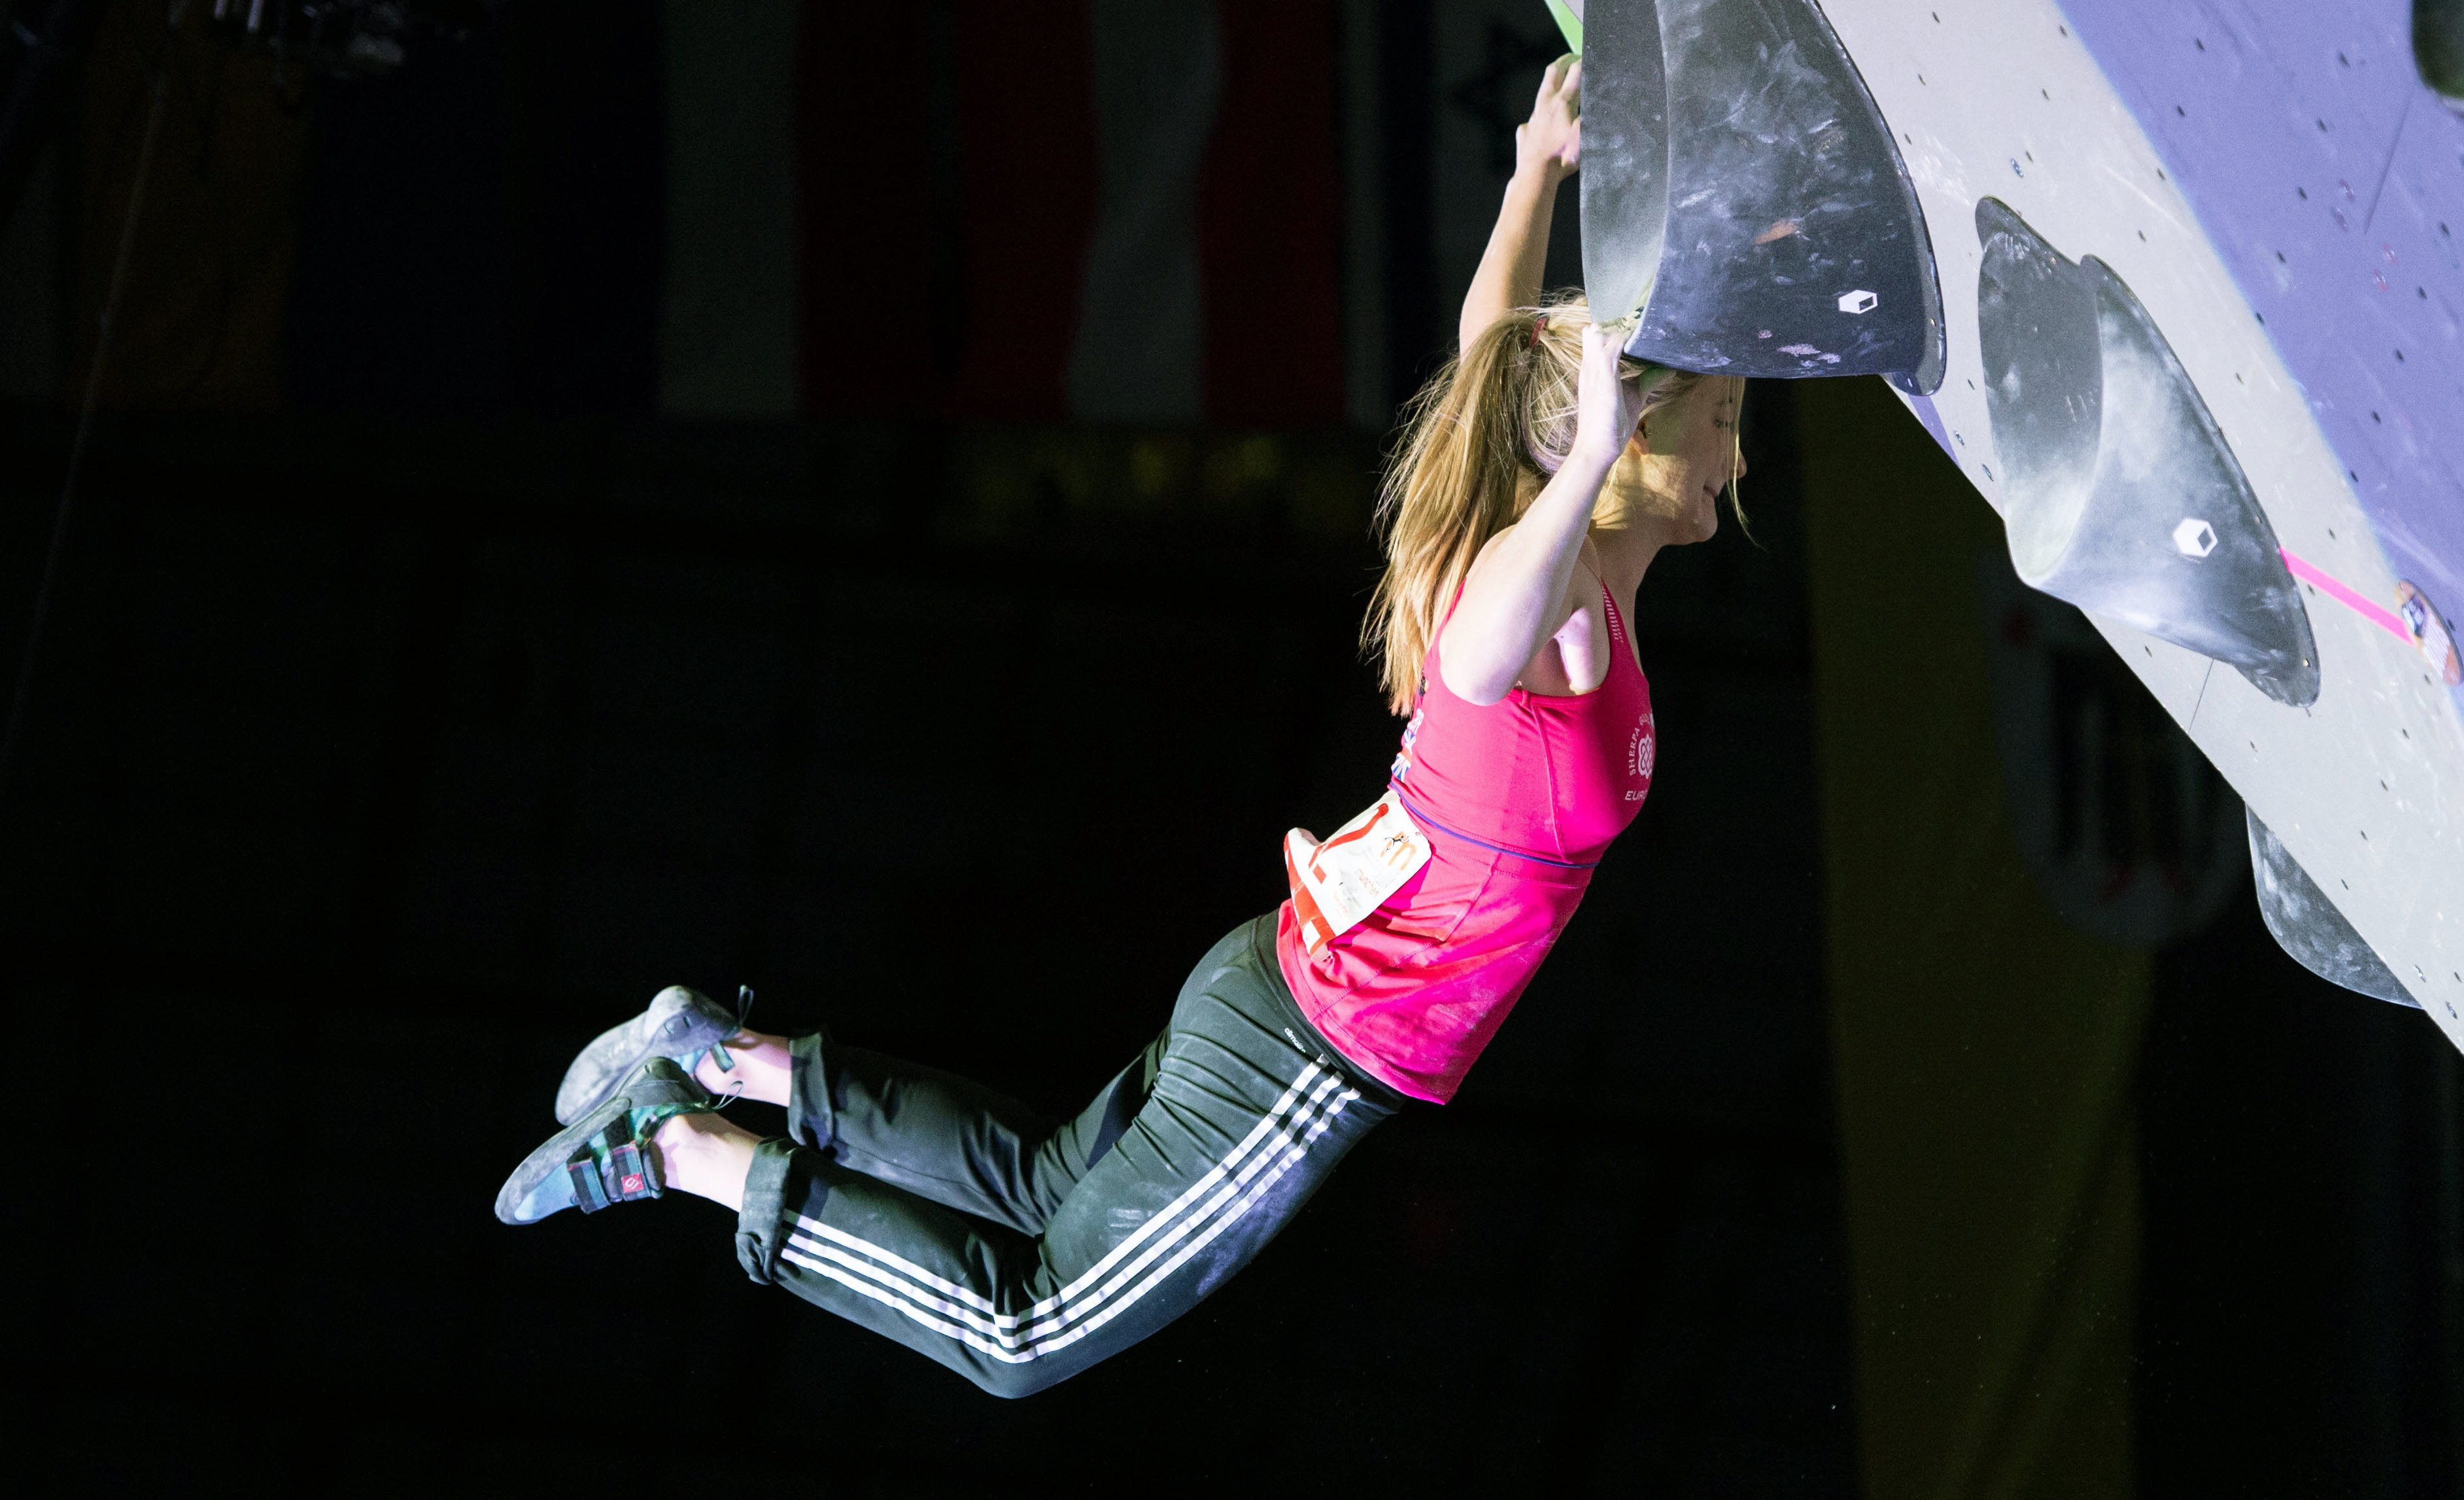 British climber Shauna Coxsey says knee injury won't affect her Olympic place